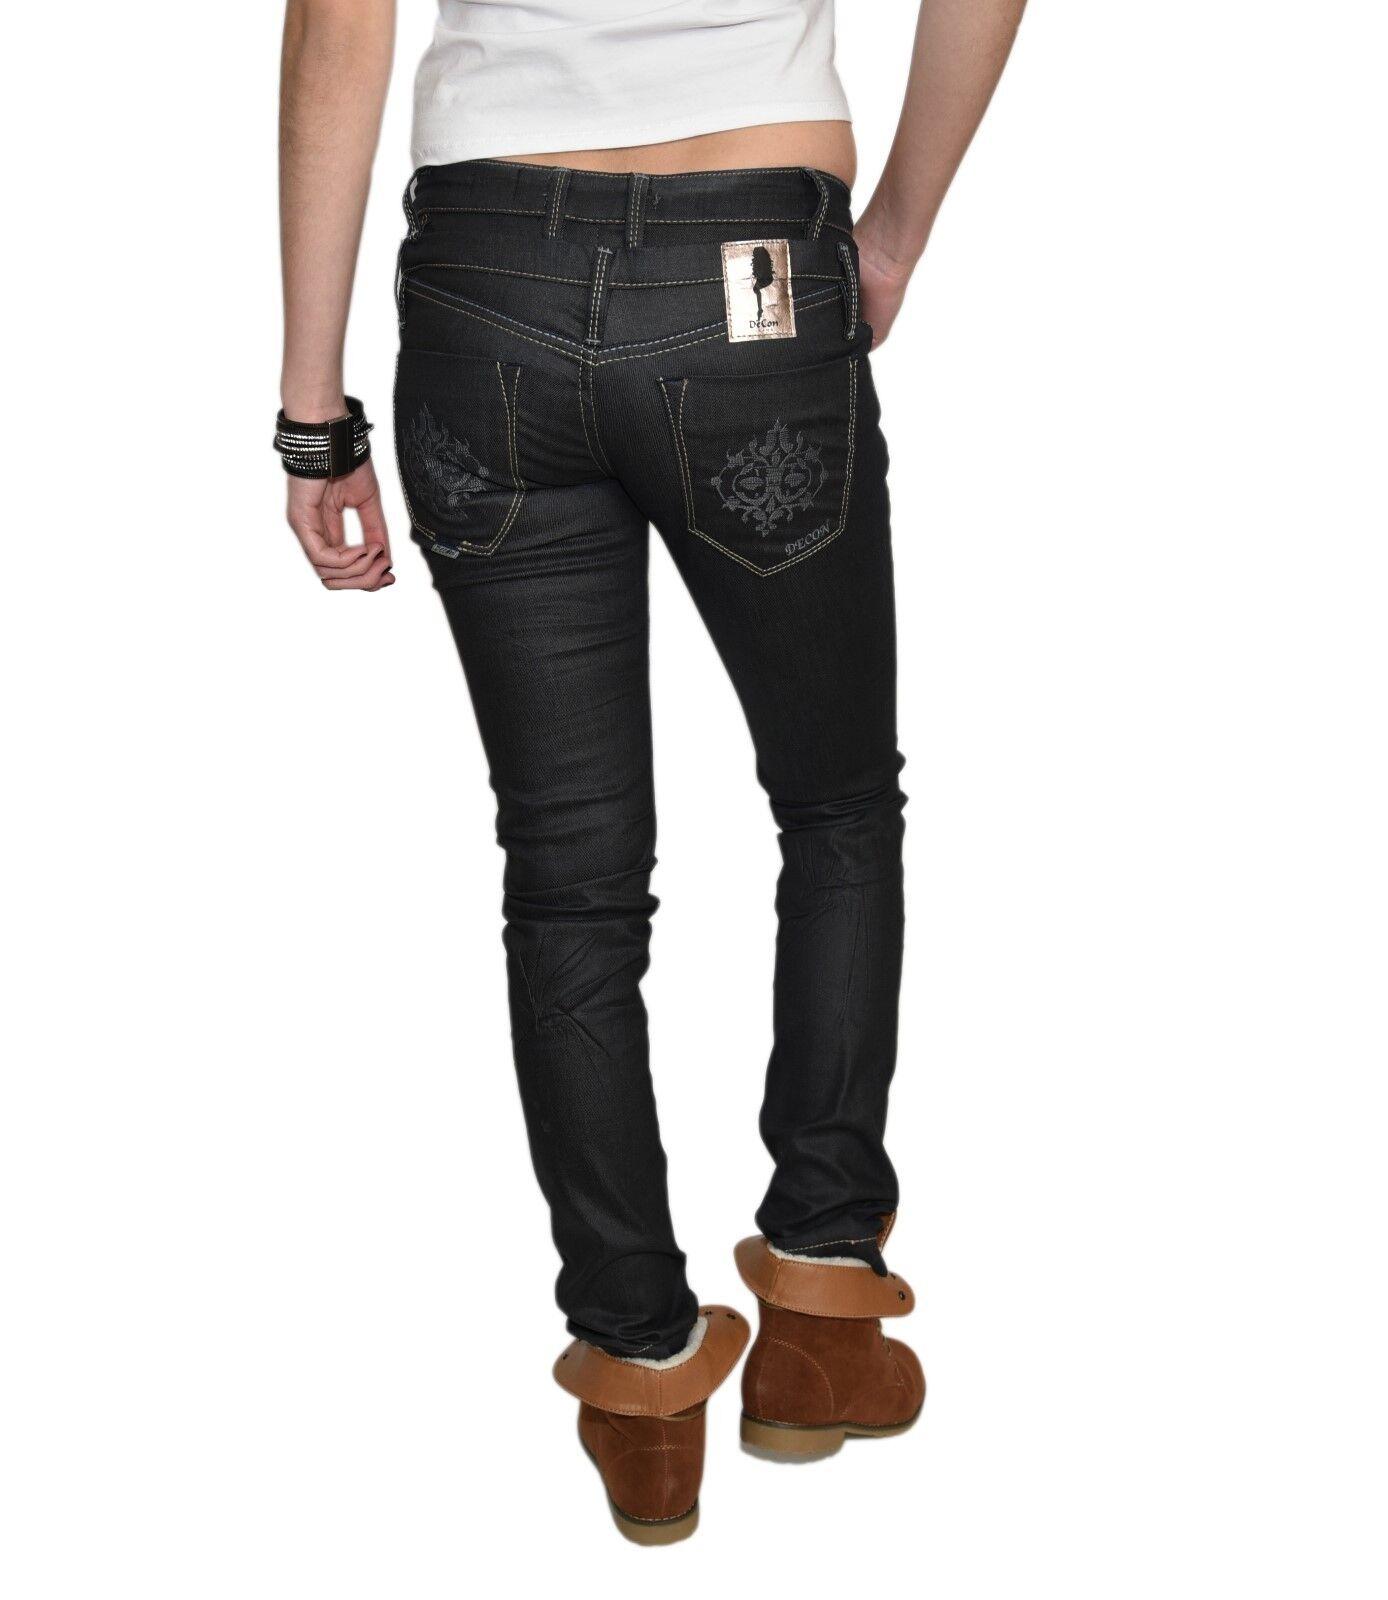 Damen Jeans Hüfthose Hose Slim Fit Skinny Stoff Röhre W24-W32 L32 L34 blau Decon